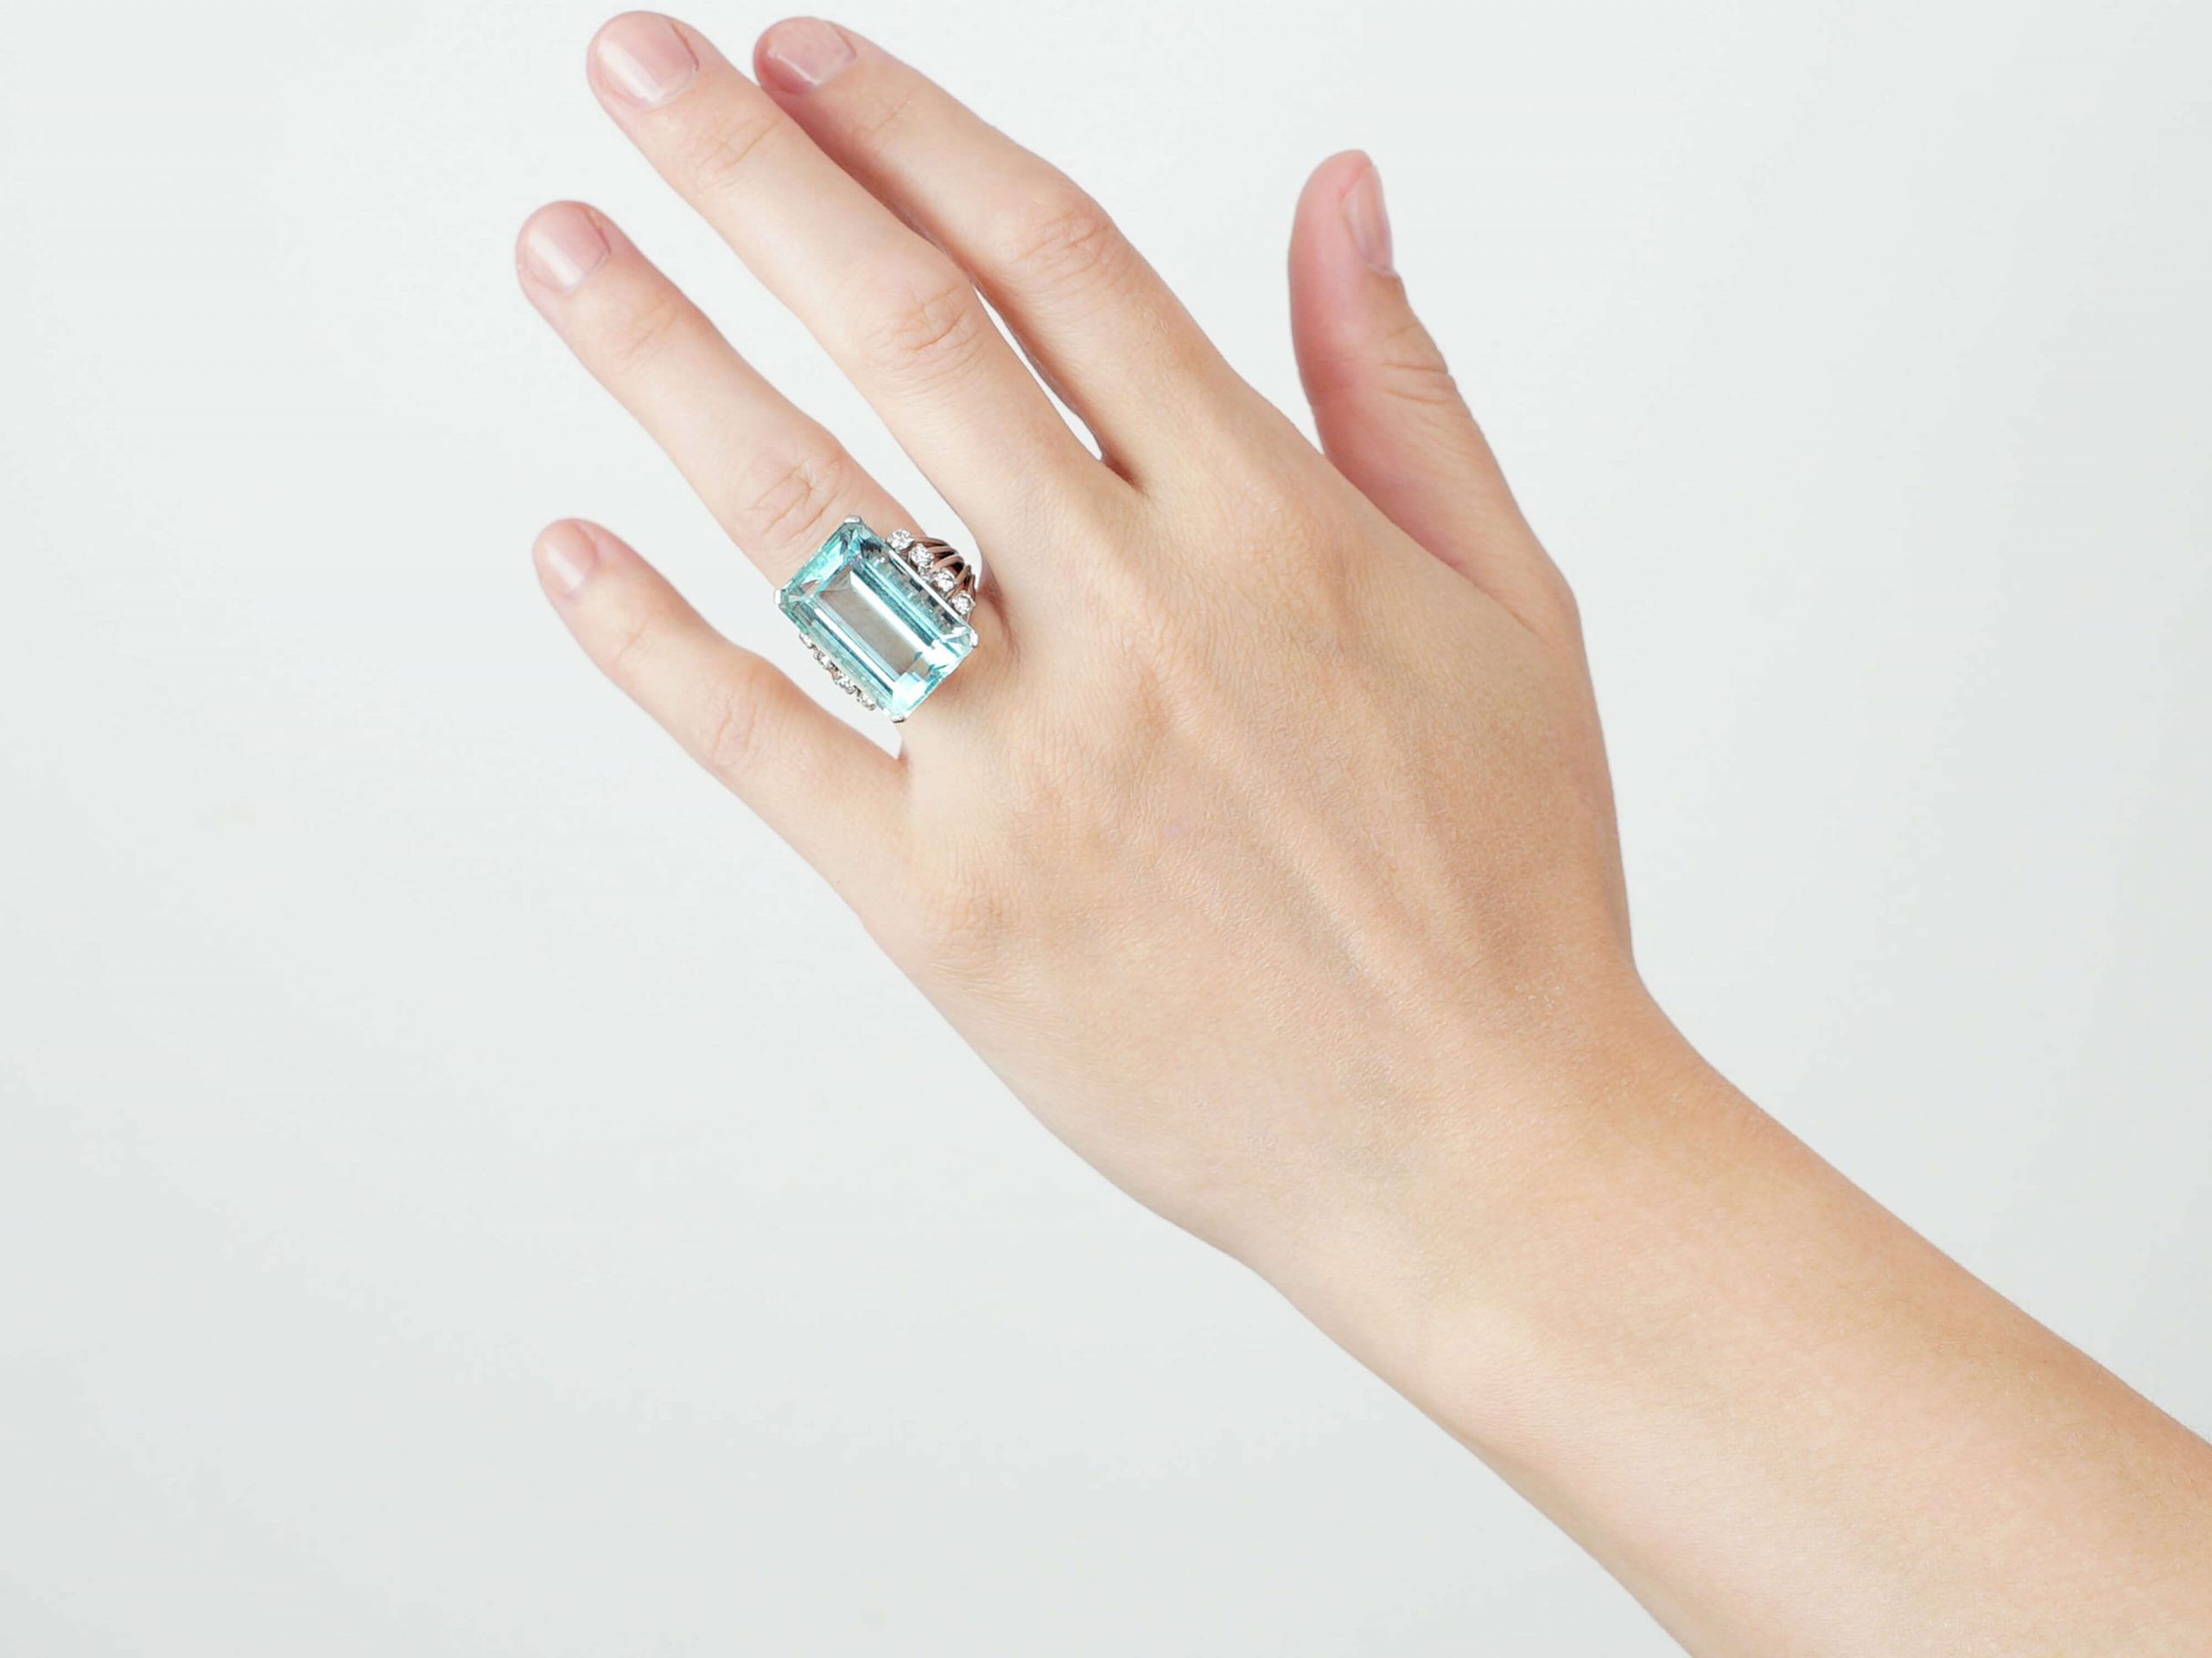 18ct White Gold Ring set with a Large Aquamarine & Diamonds